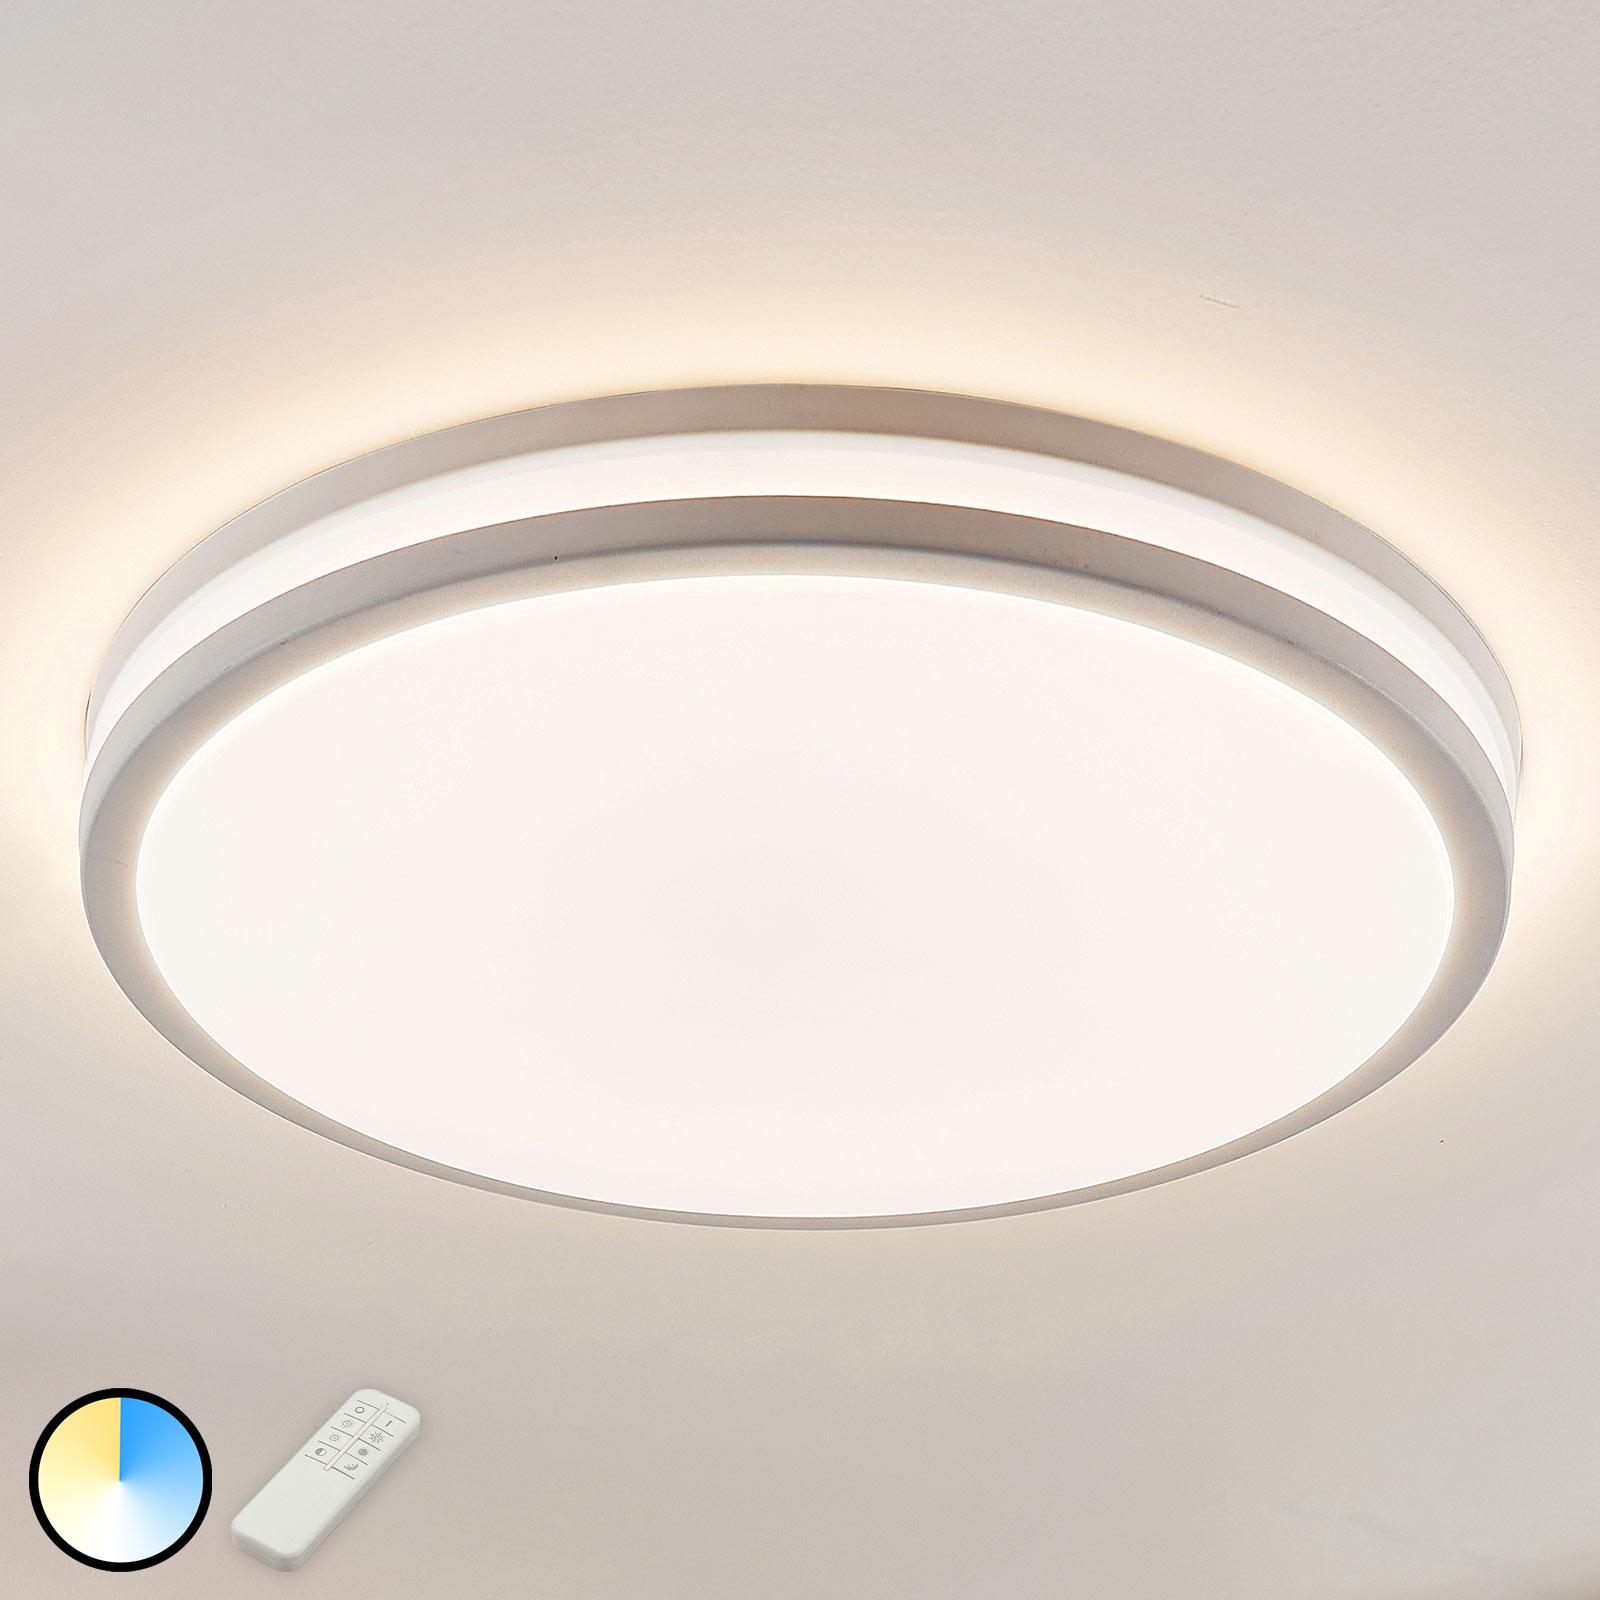 LED-loftslampe Arnim i hvid, rund form